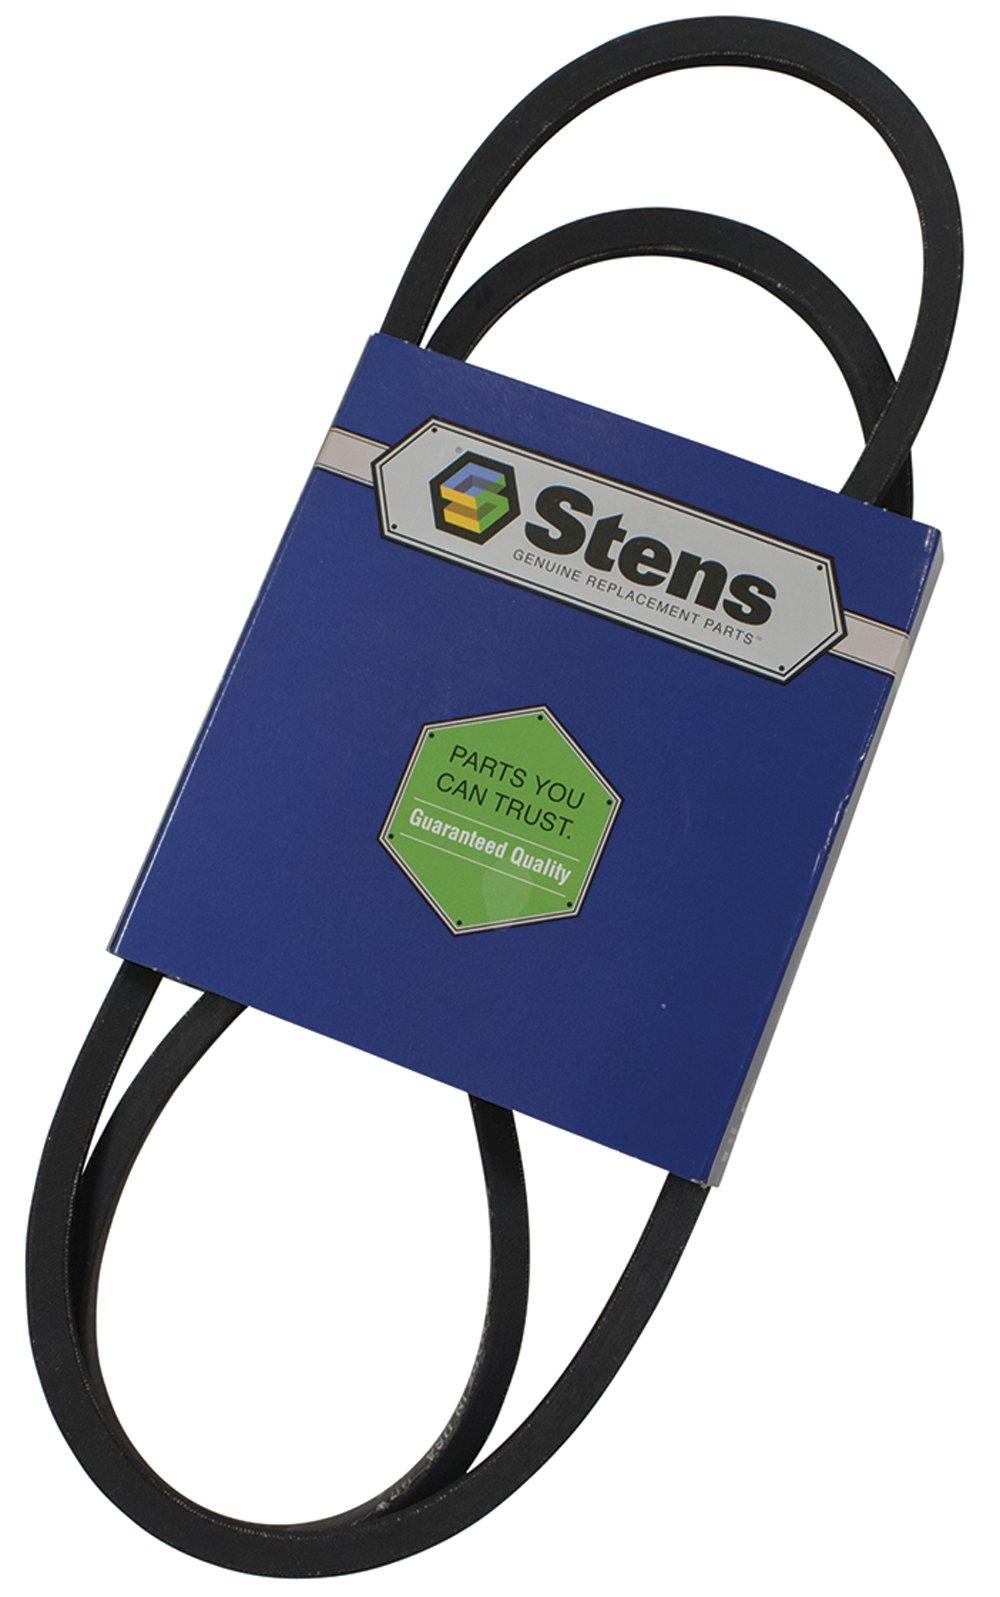 Stens 265-856 OEM Replacement Belt/Hustler 781443